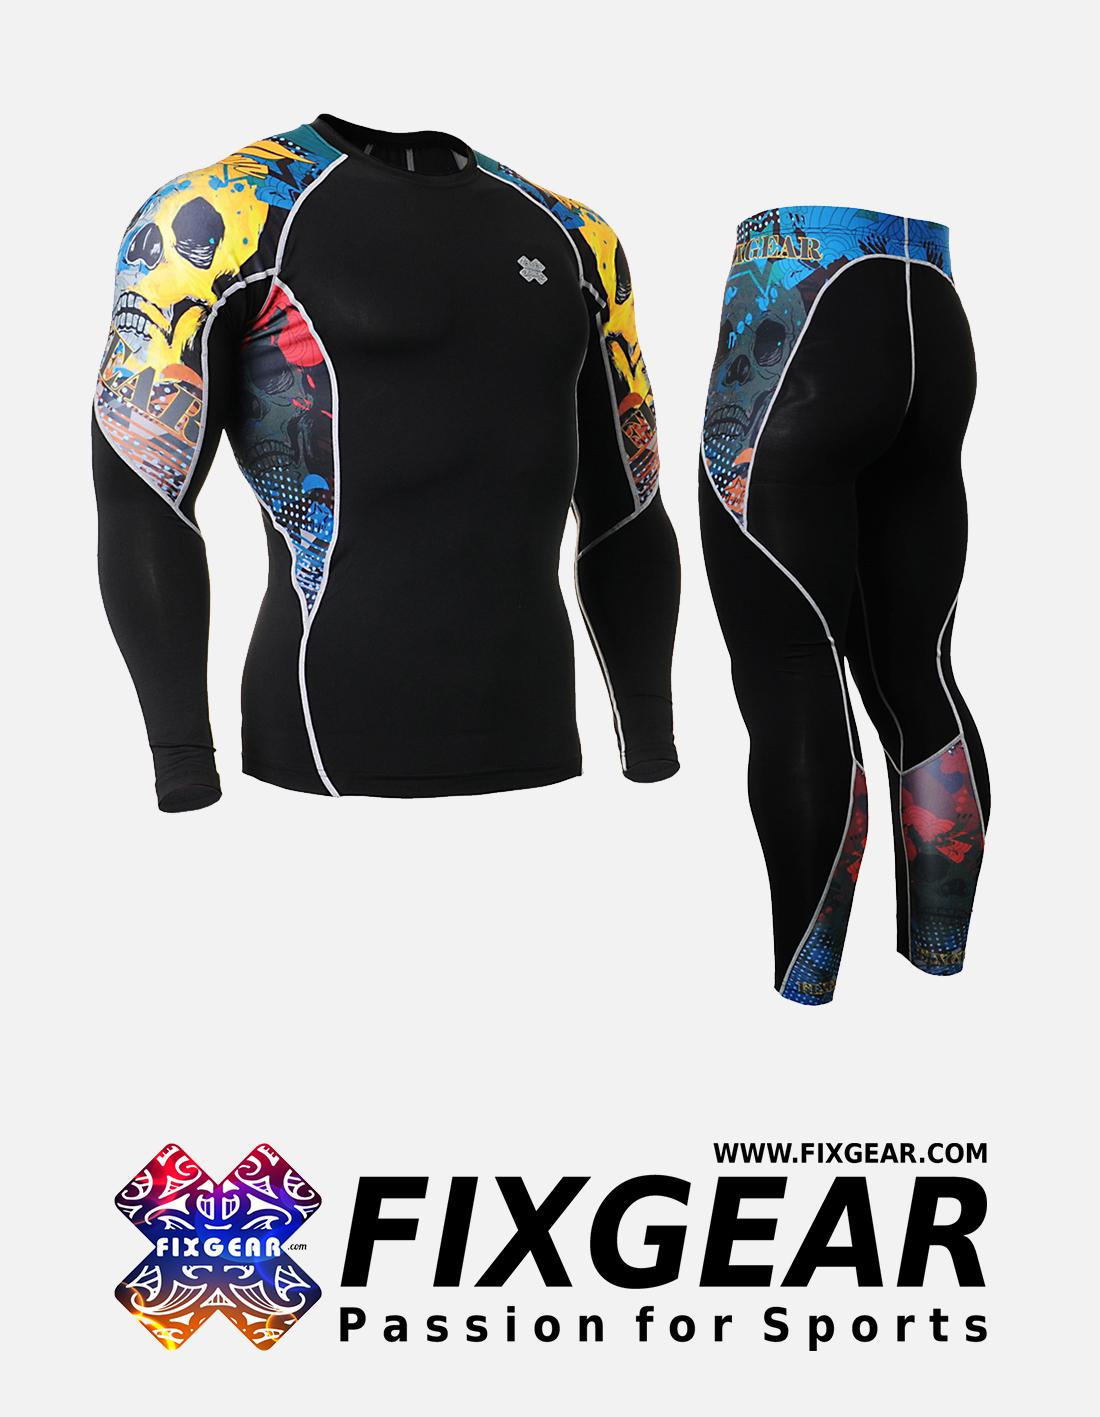 FIXGEAR C2L-P2L-B46 Set Compression Base Layer Shirt & Legging Pants